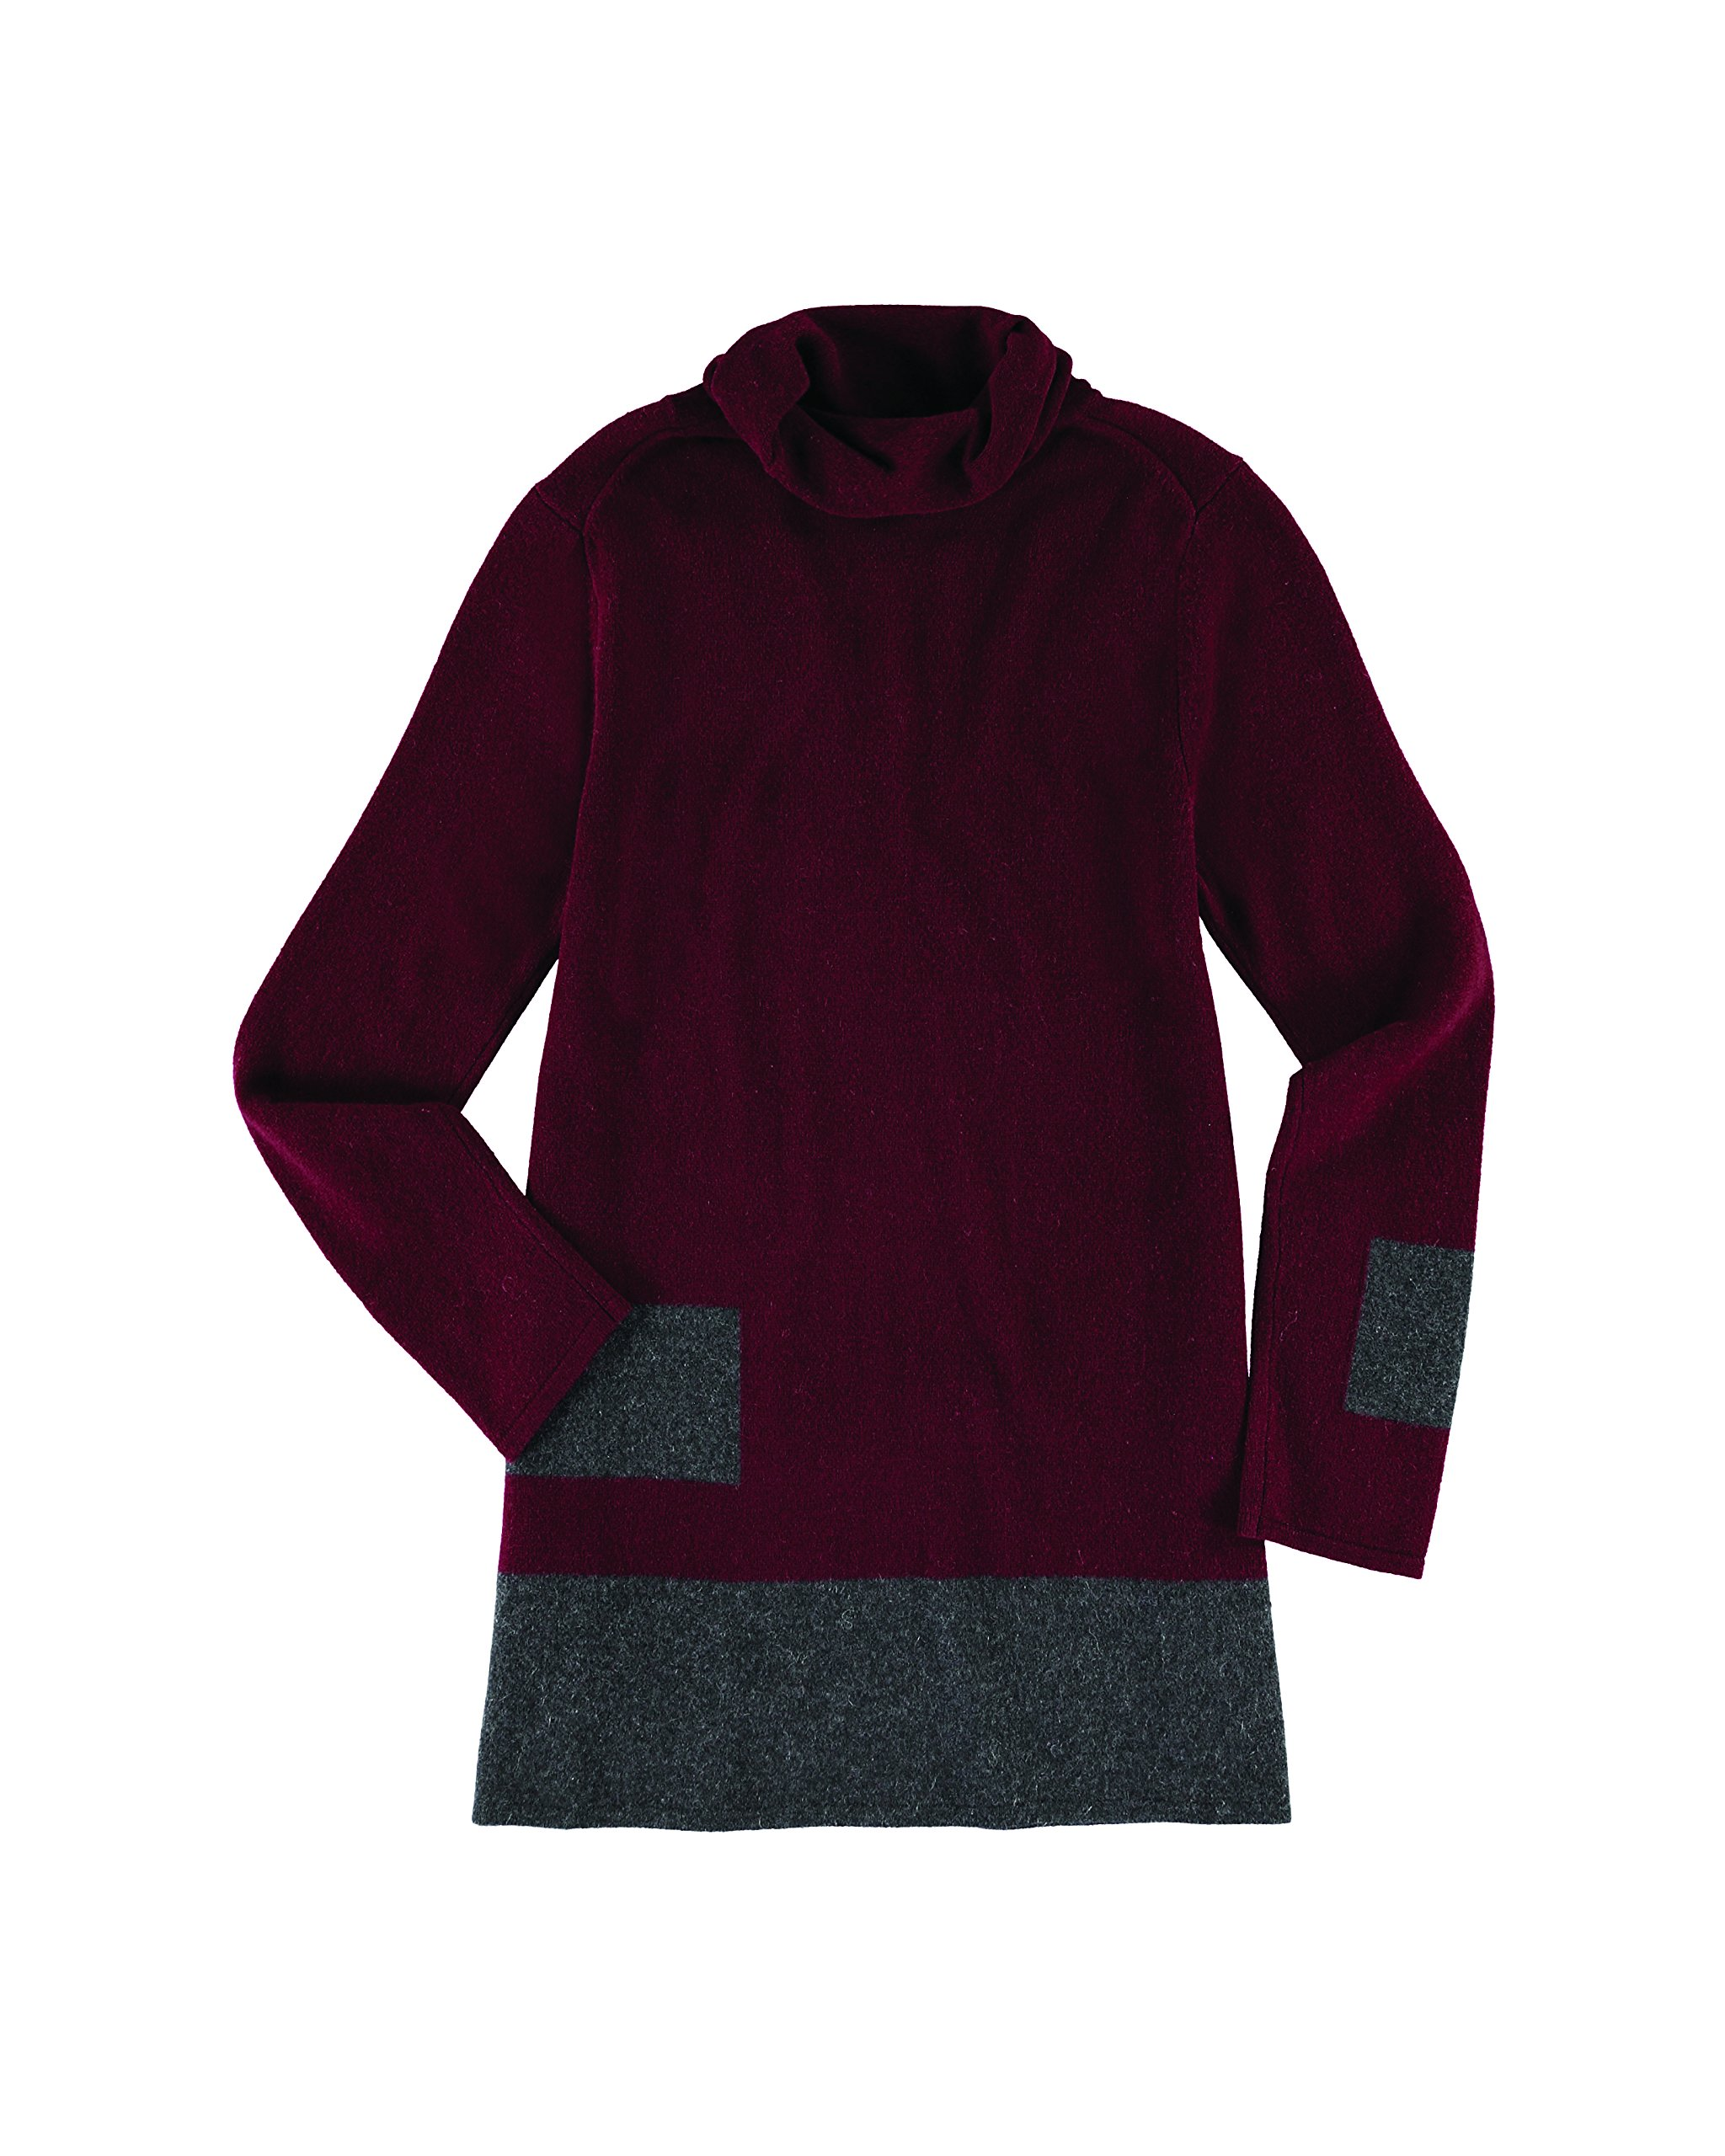 Krimson Klover Stacks Cashmere Tunic - ( Bordeaux, X-Small )